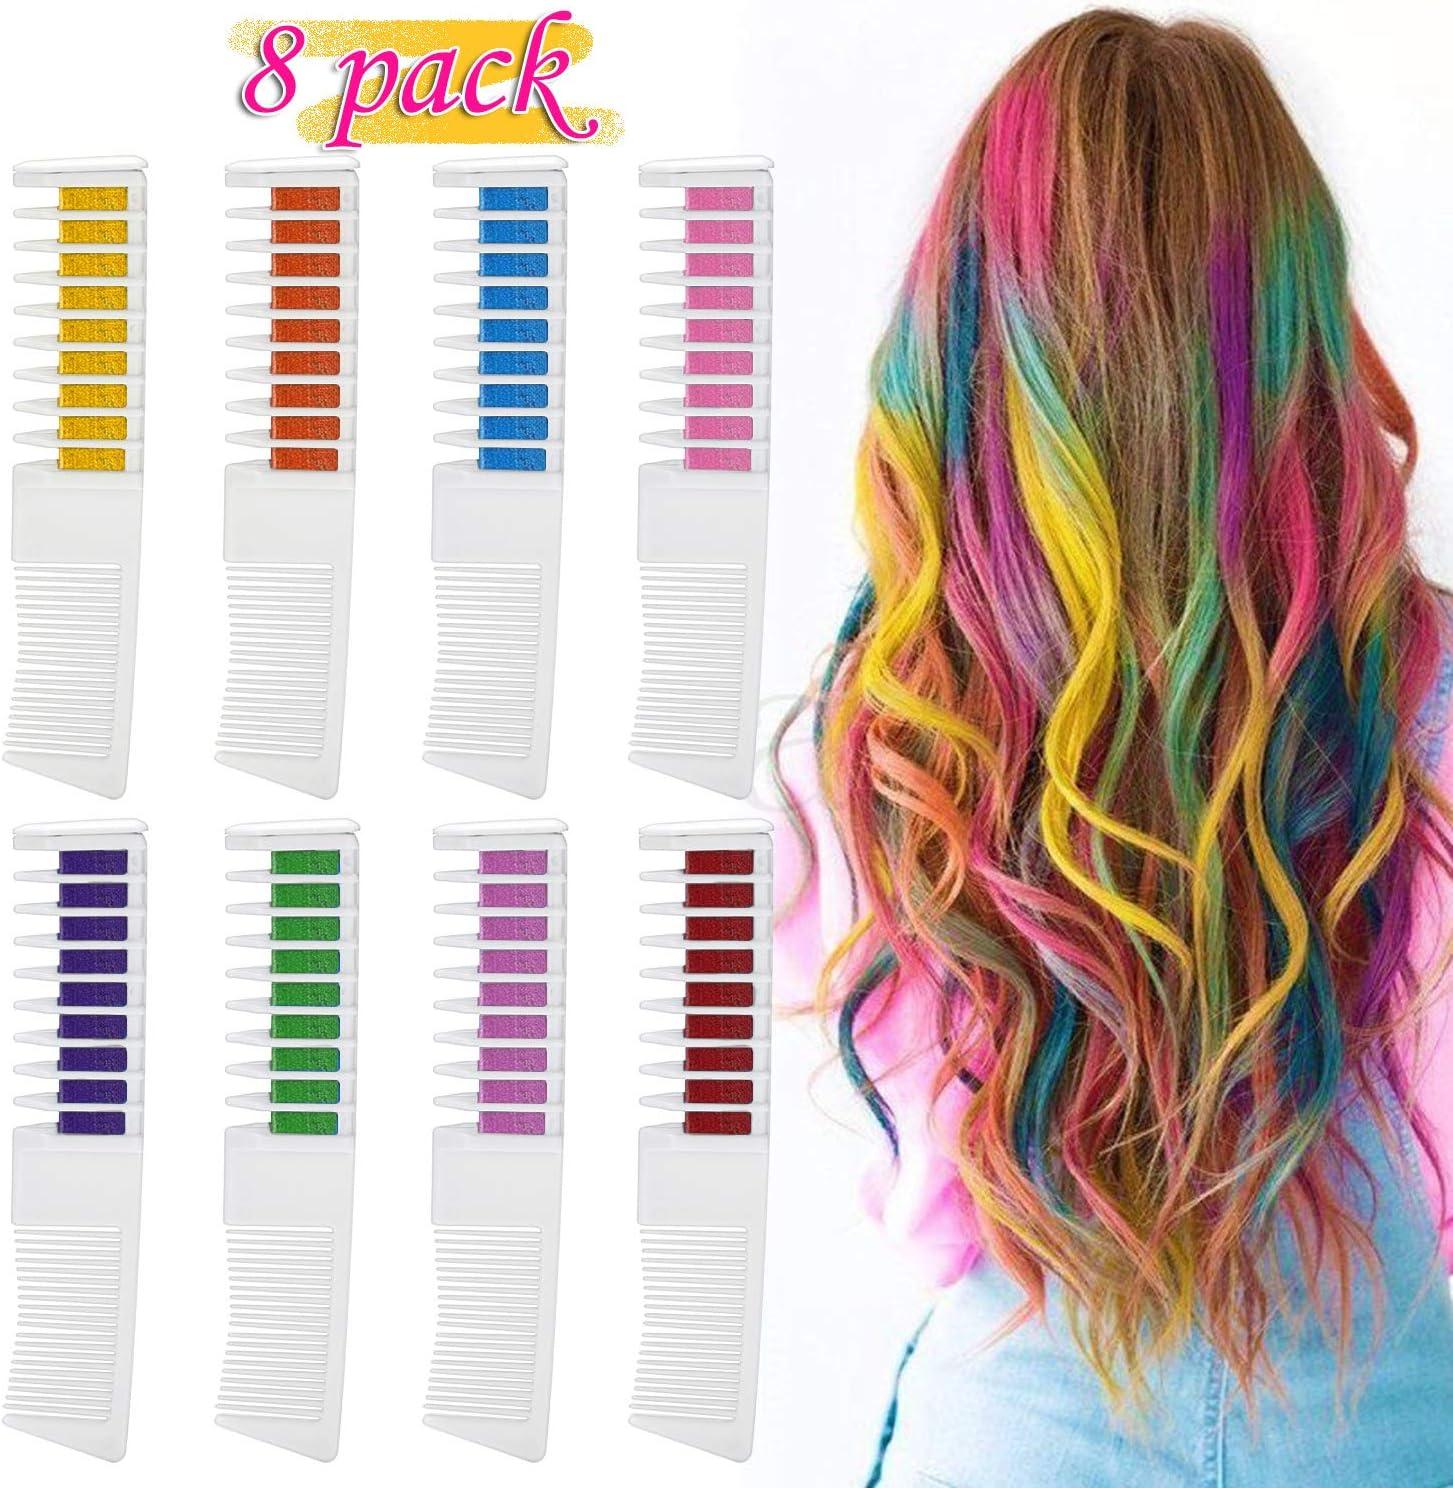 Pascua de Resurrección Tinte para el cabello Tiza de Pelo,Emooqi Temporal CabelloTiza Color 8 Colores 2 en 1 peine Coloración de cabello Tinte no ...